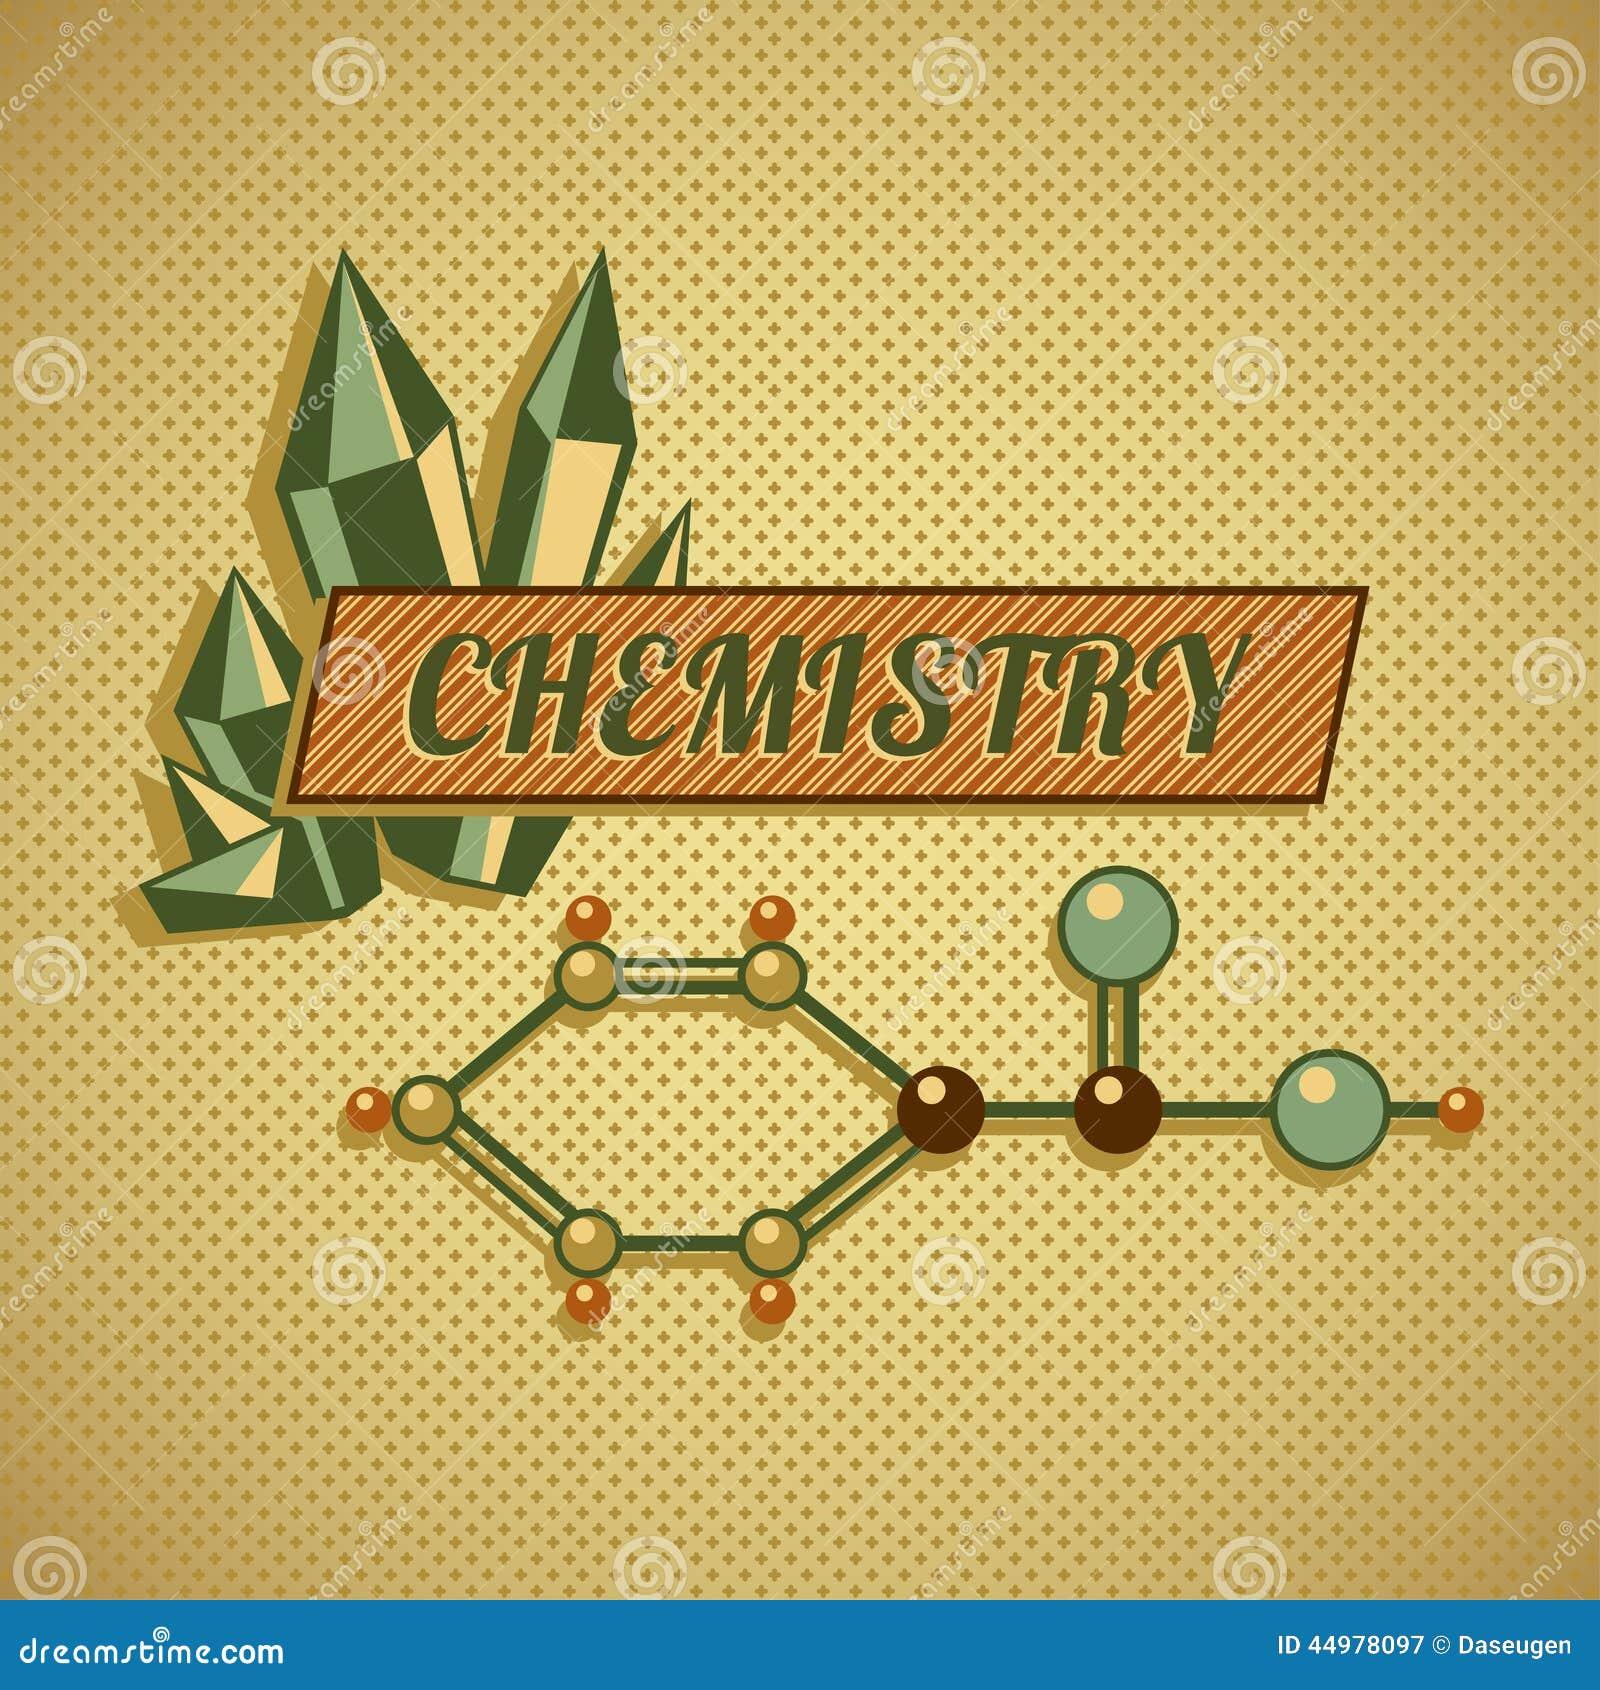 Chemy